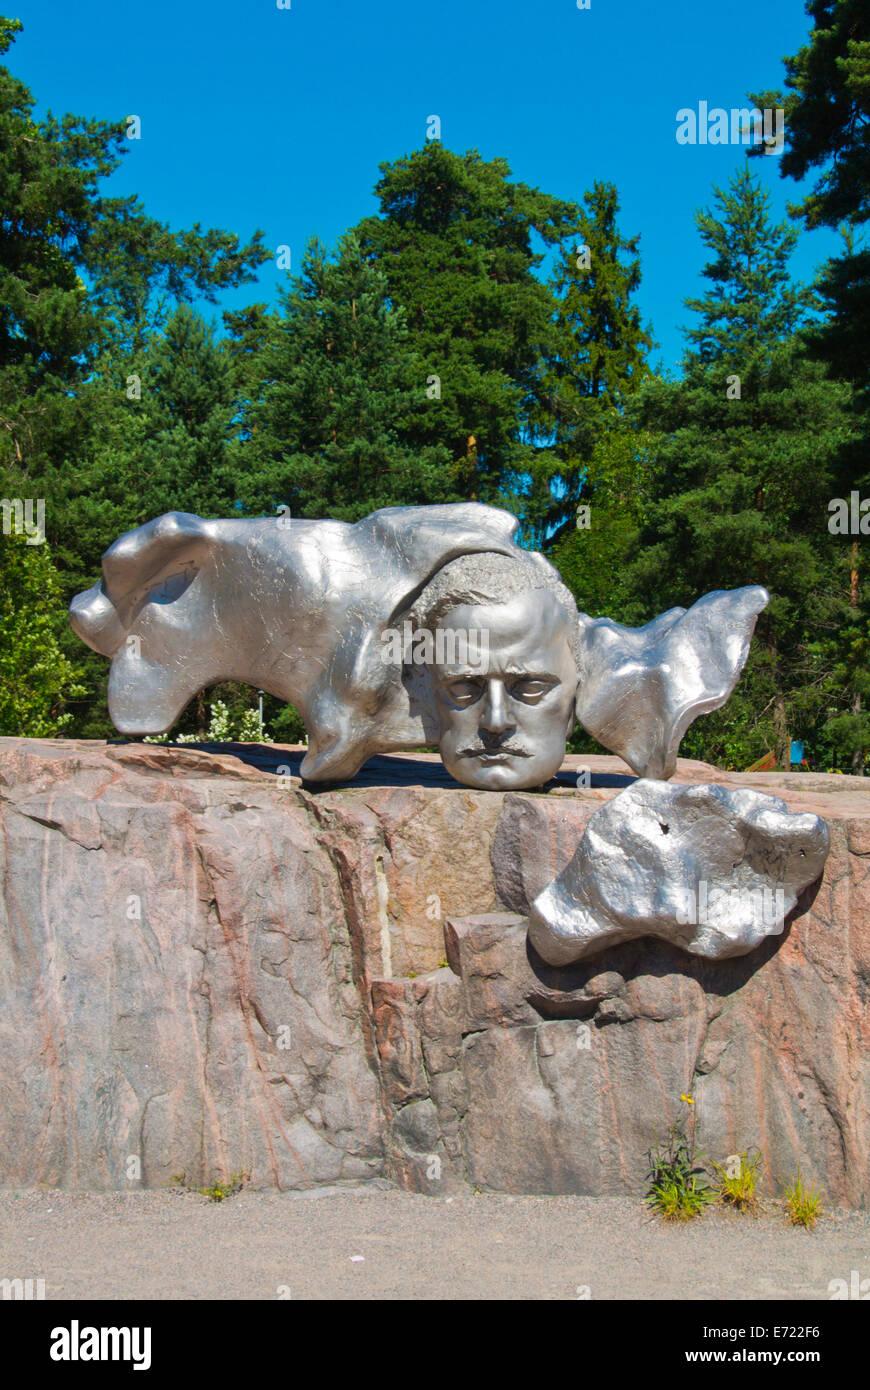 Sibelius relief, part of the Sibelius Monument sculpture,  Sibeliuksen puisto, Sibelius park, Töölö - Stock Image